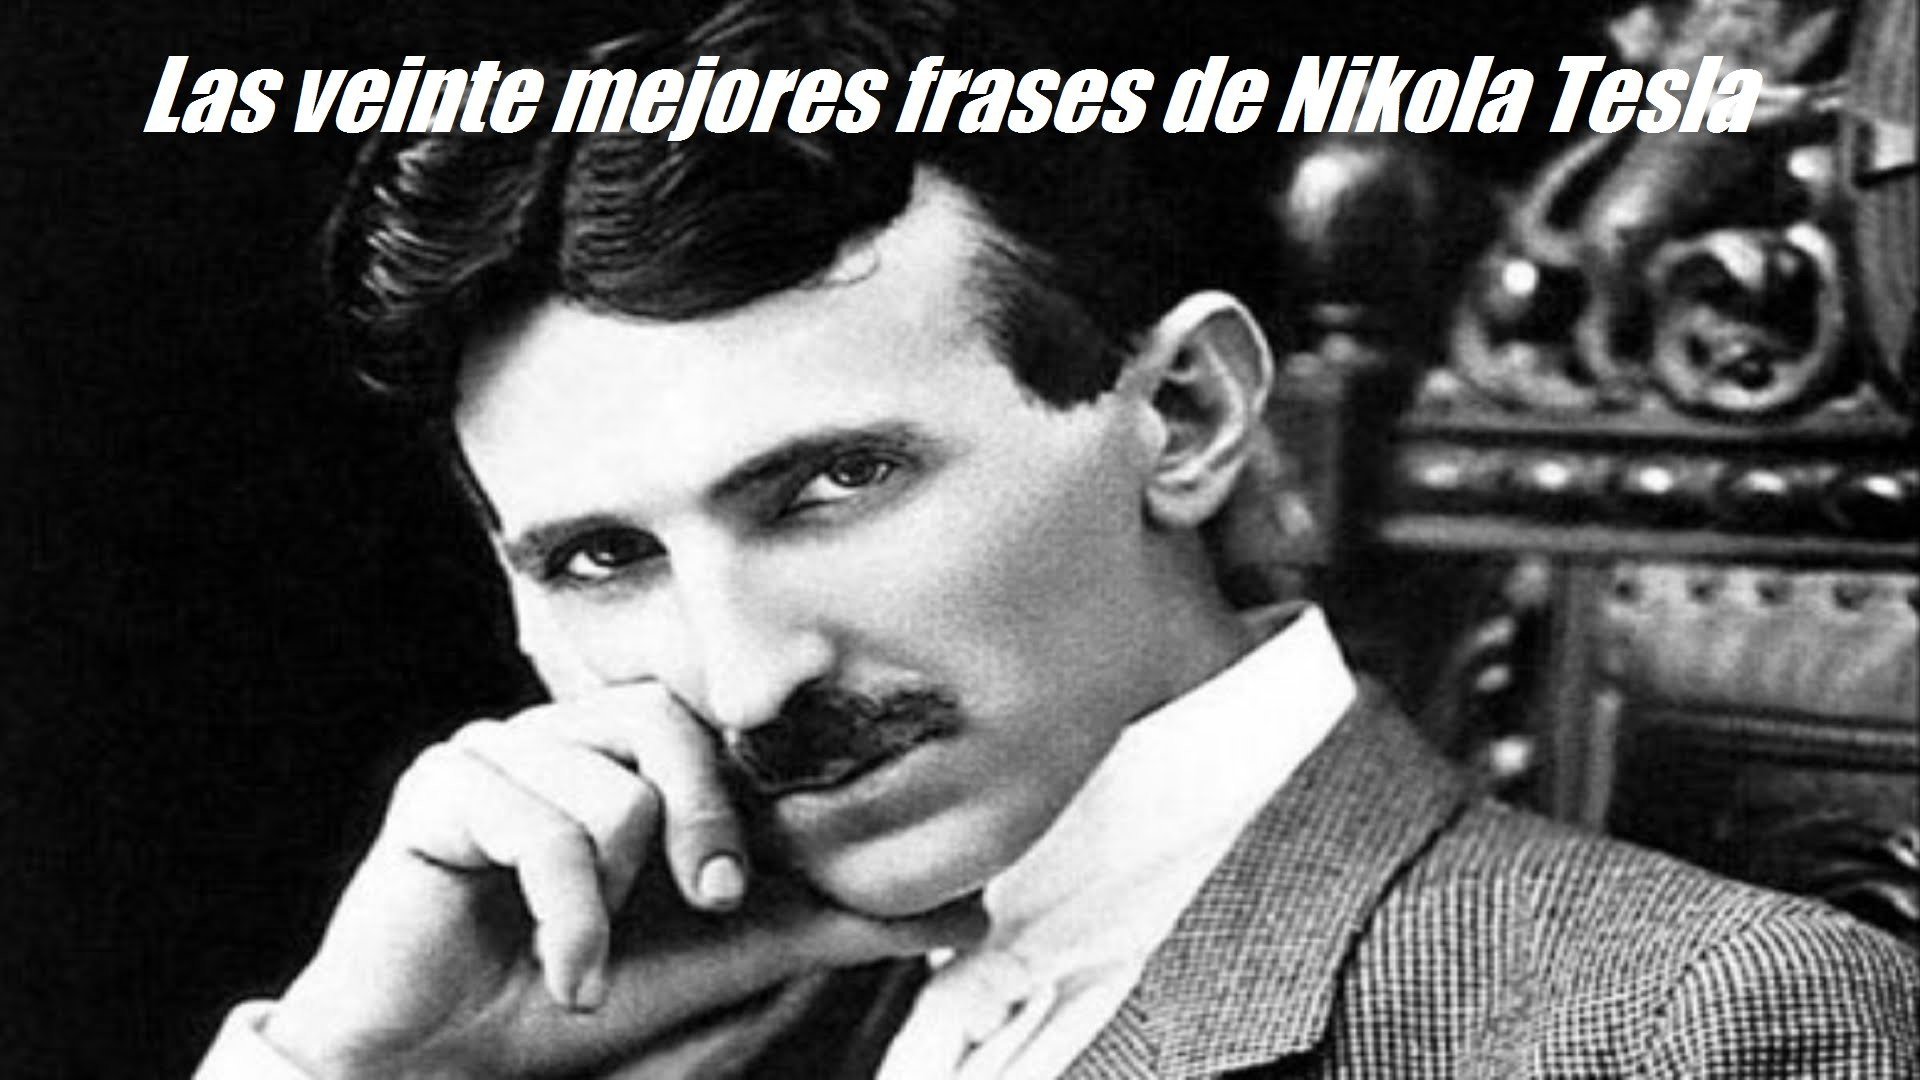 Nikola Tesla Wallpapers High Quality | Download Free